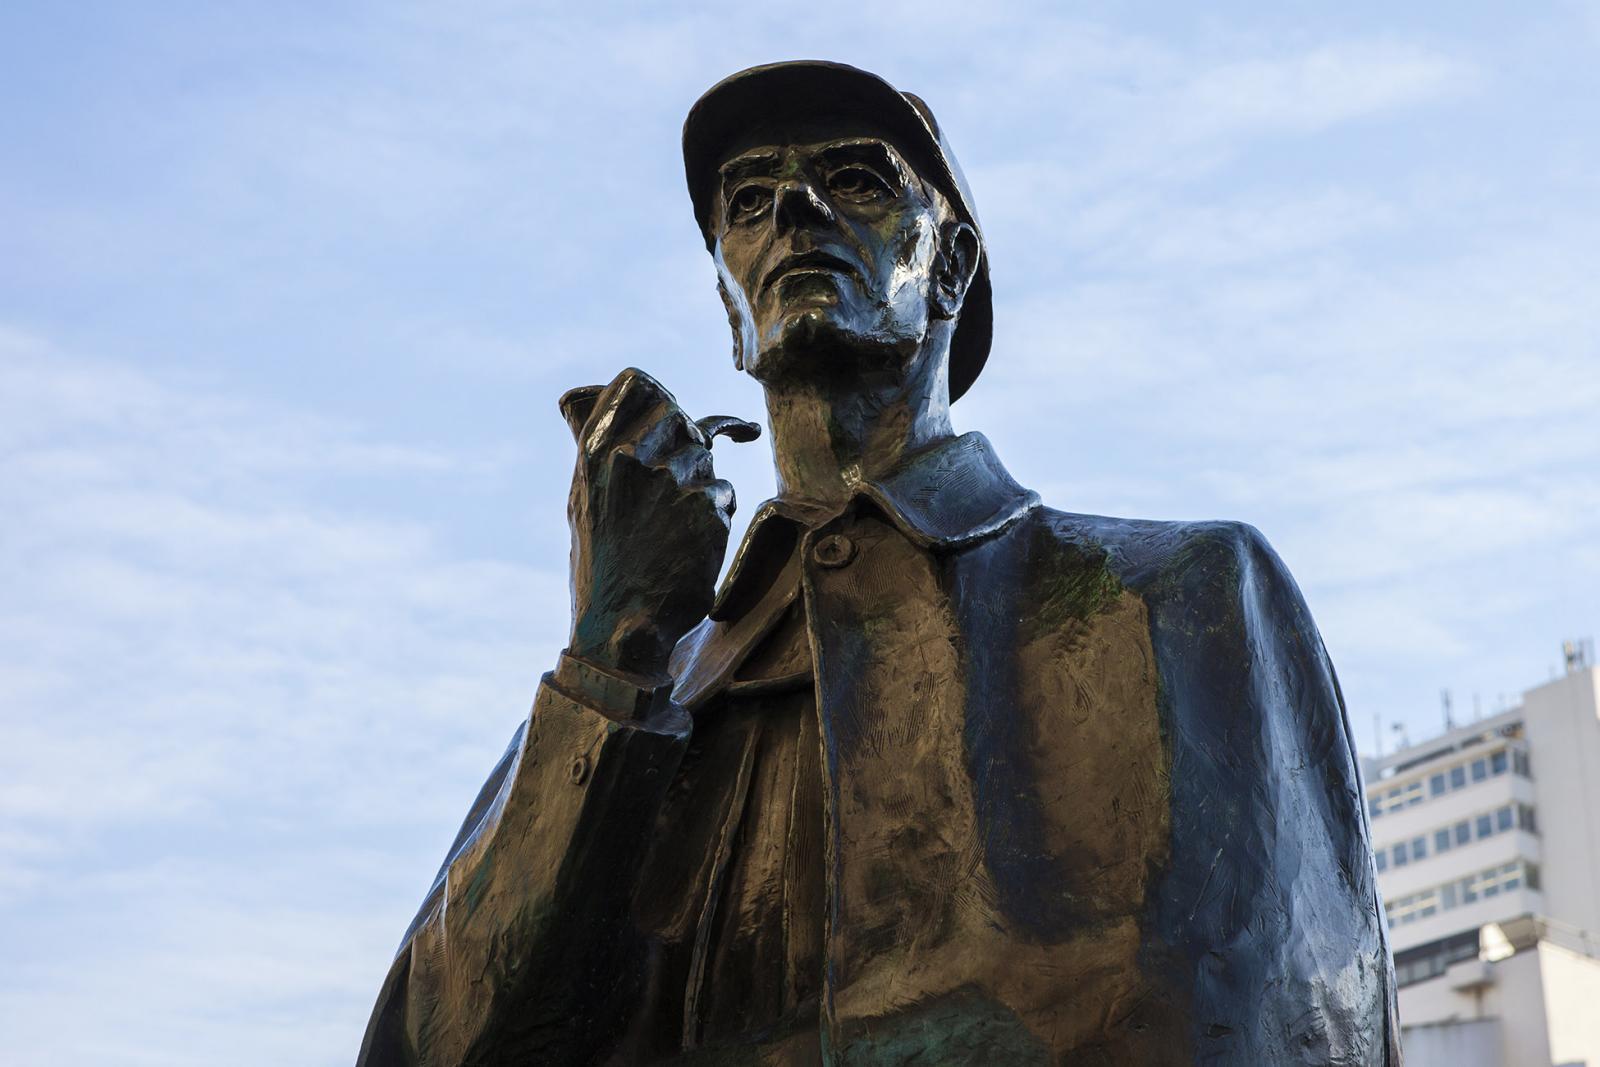 Sherlock Holmes in Paddington